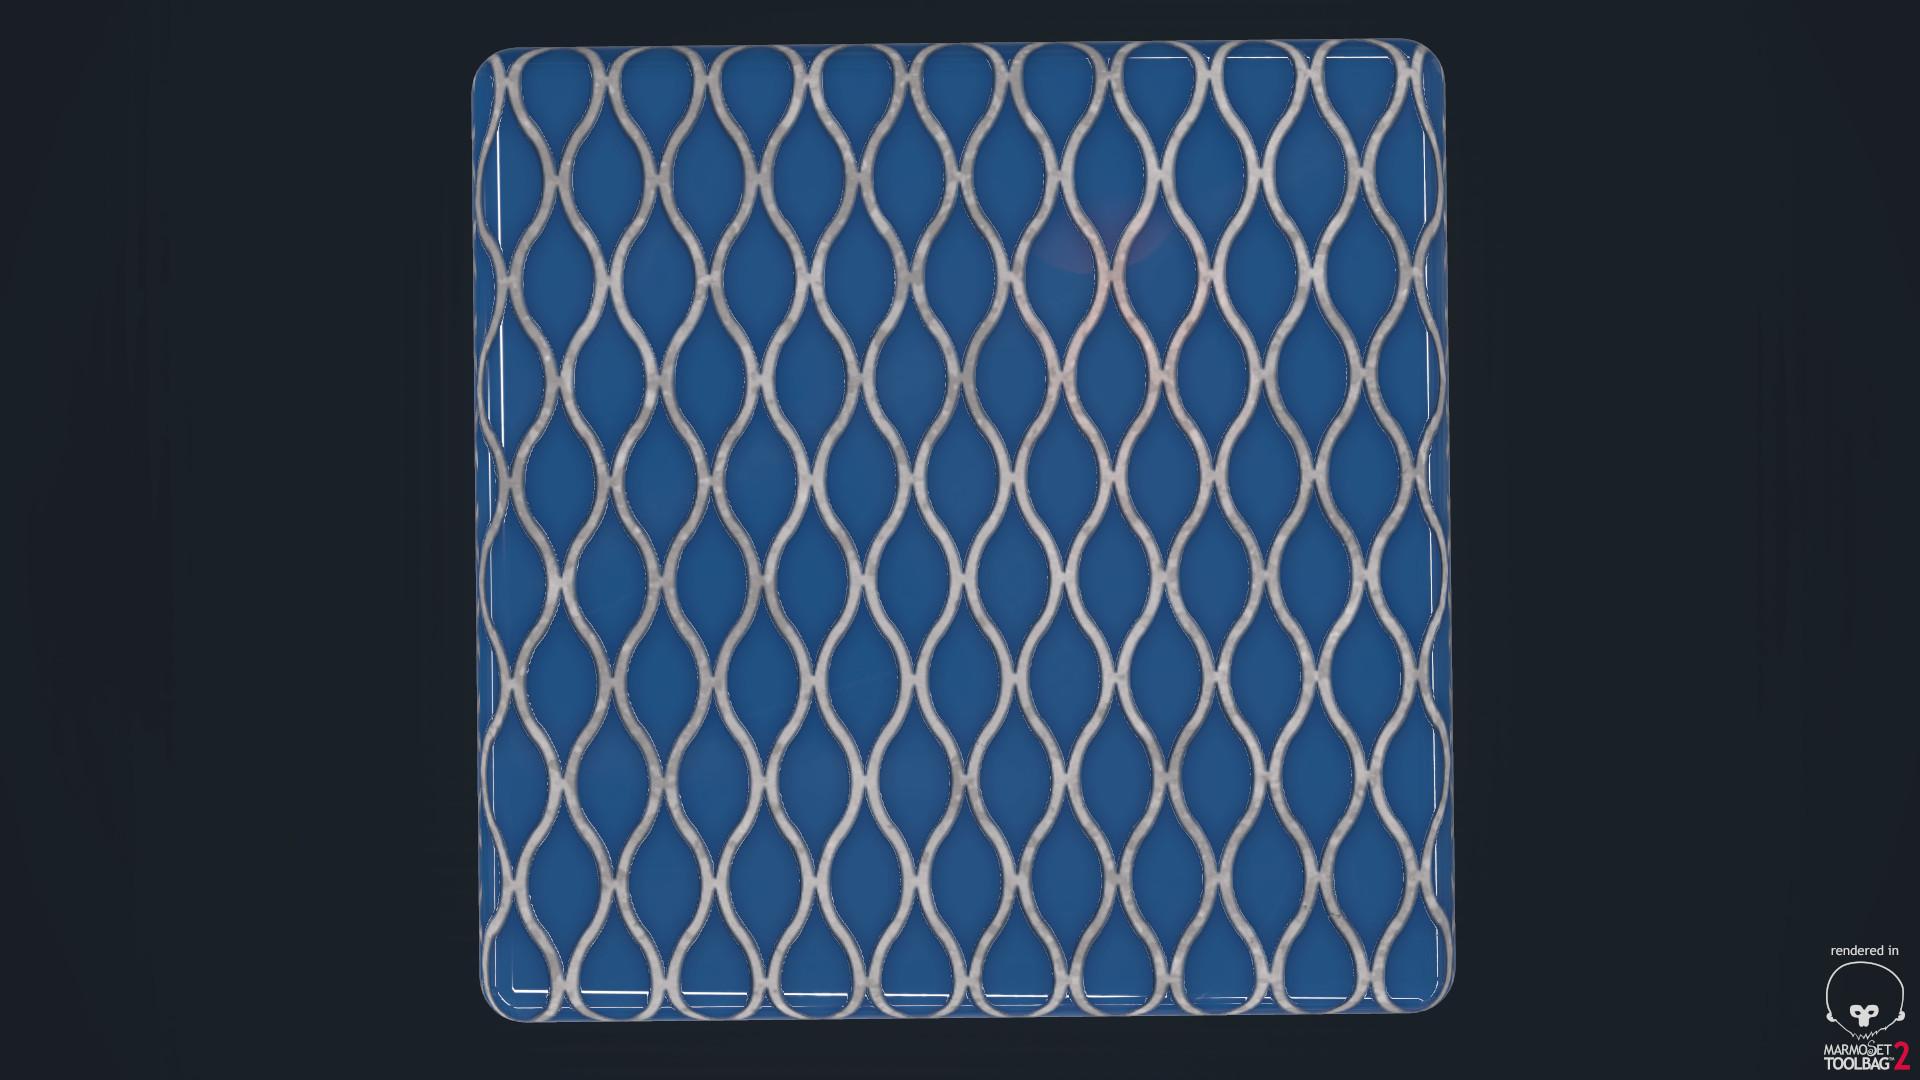 Ole midthun blue tiles 2